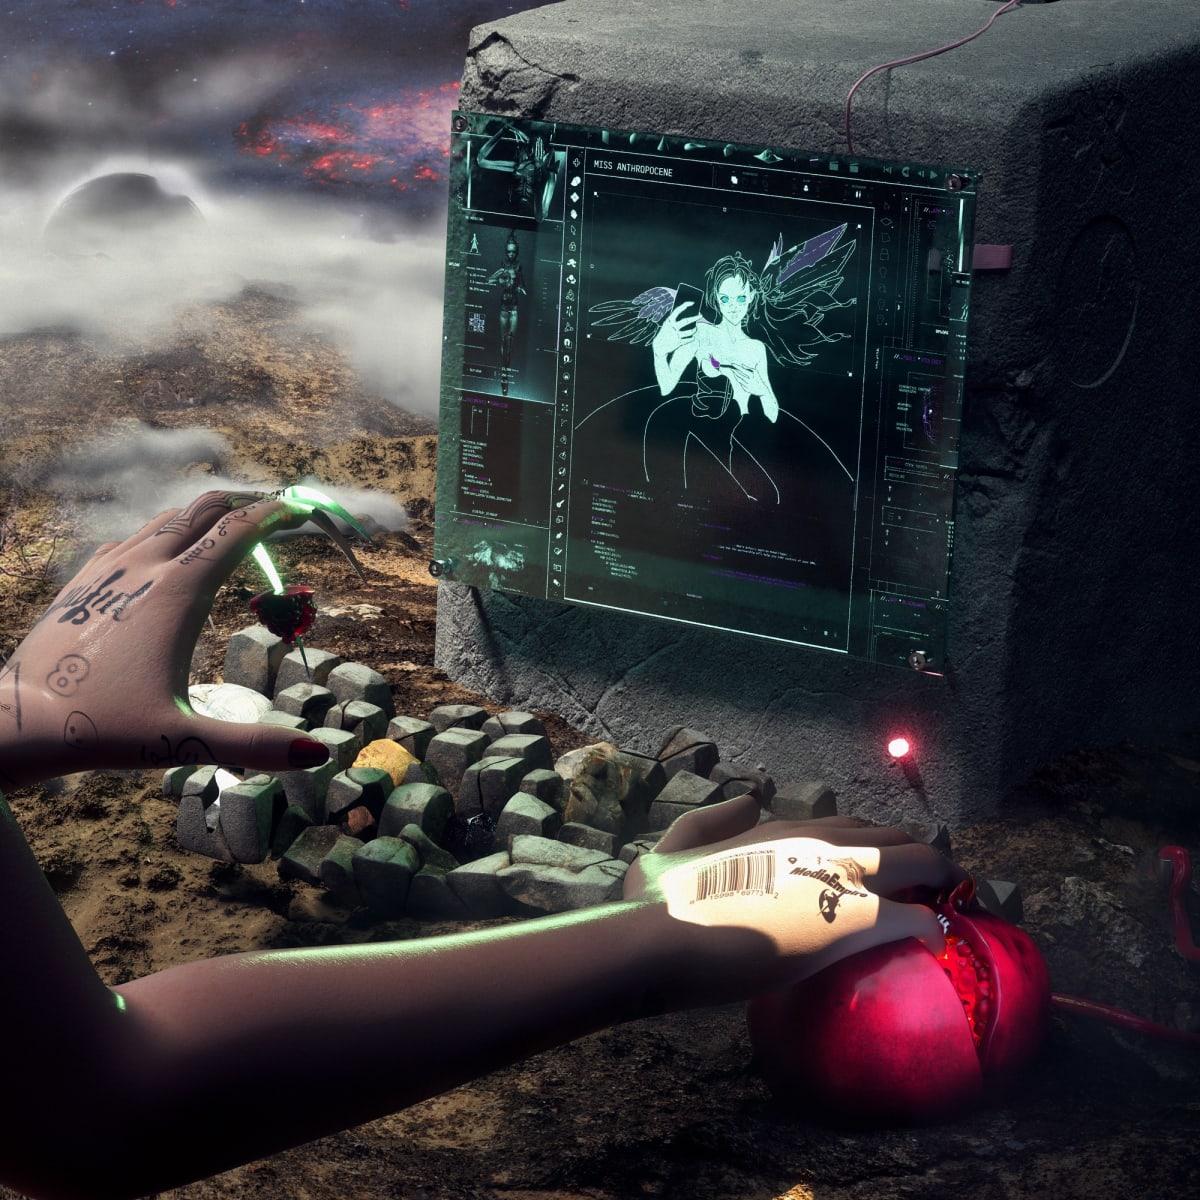 Album Review: Grimes - Miss Anthropocene